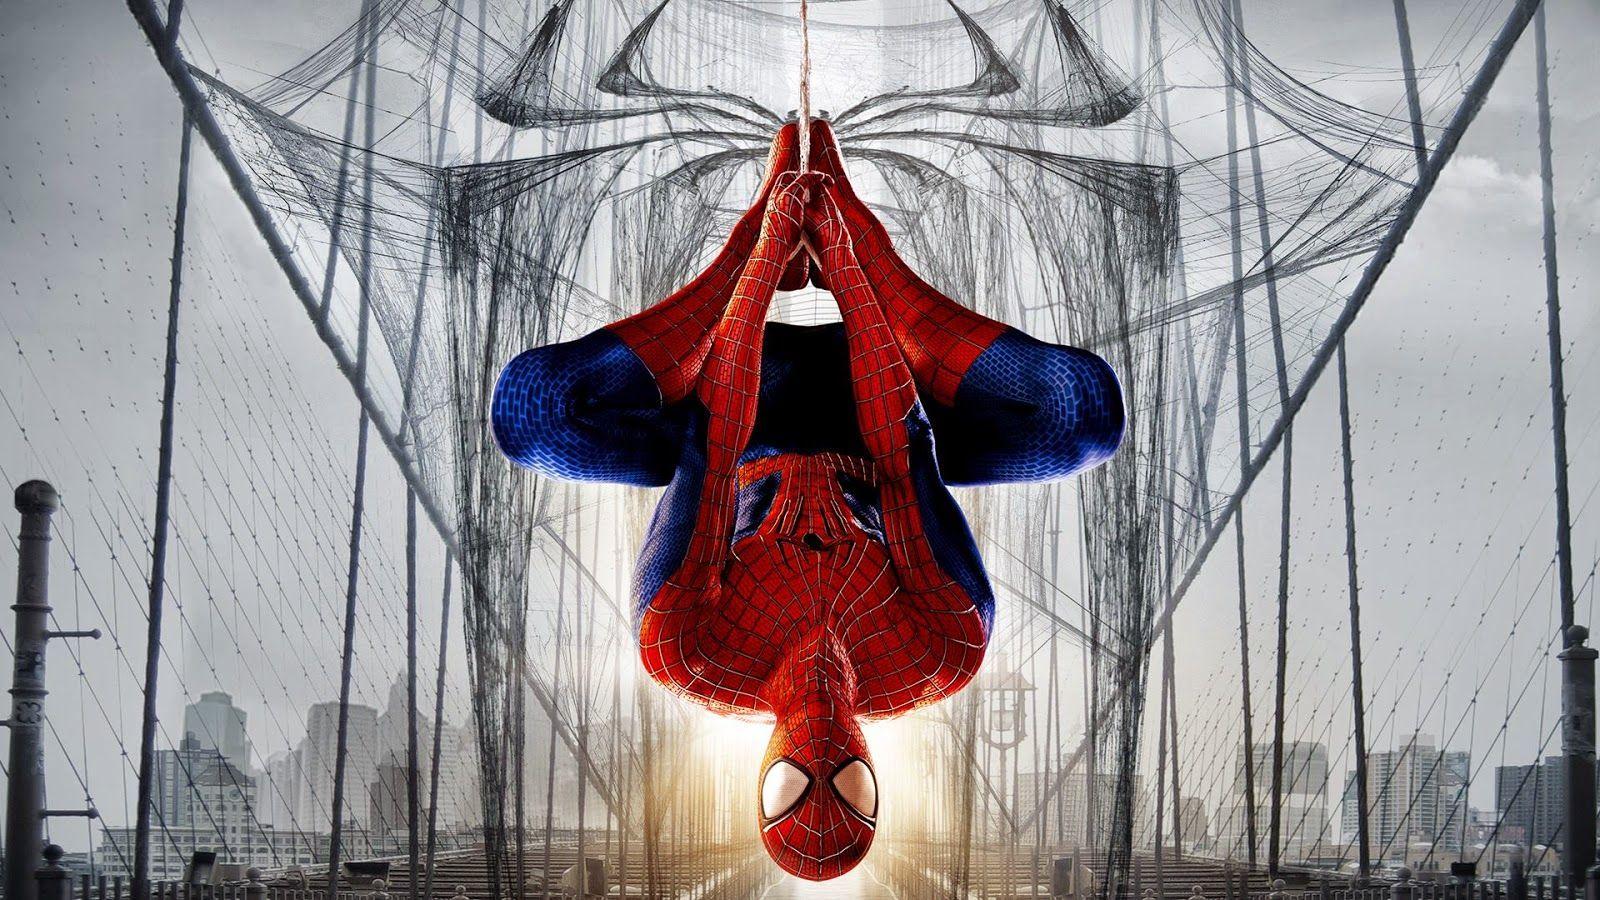 batman-vs-superman-Jaring-Spiderman-Images-wallpaper-wpc5802538